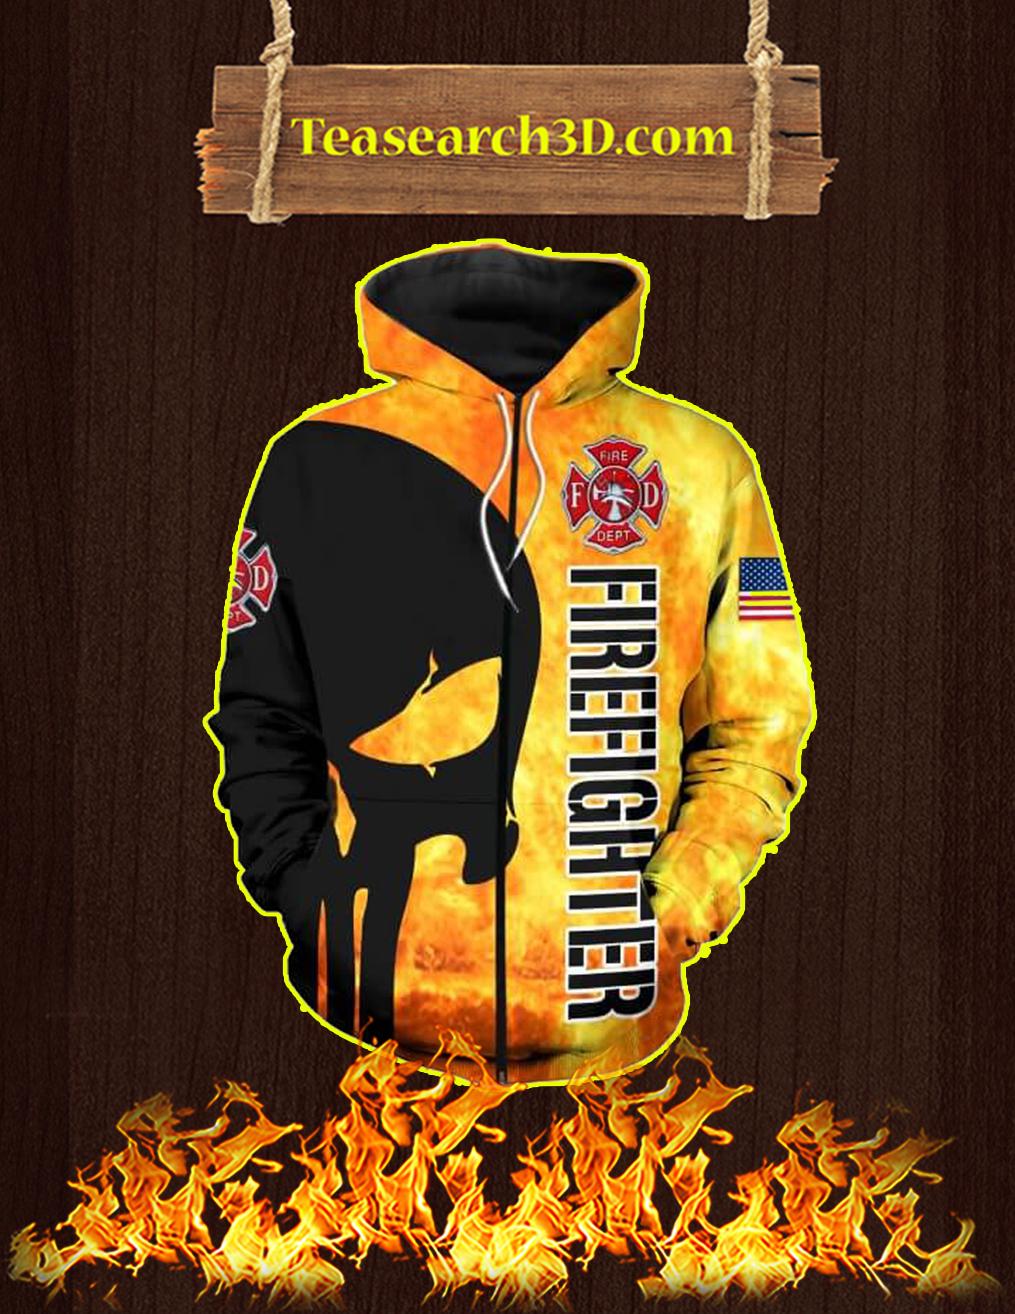 3D Printed Firefighter Punisher Skull Zip Hoodie